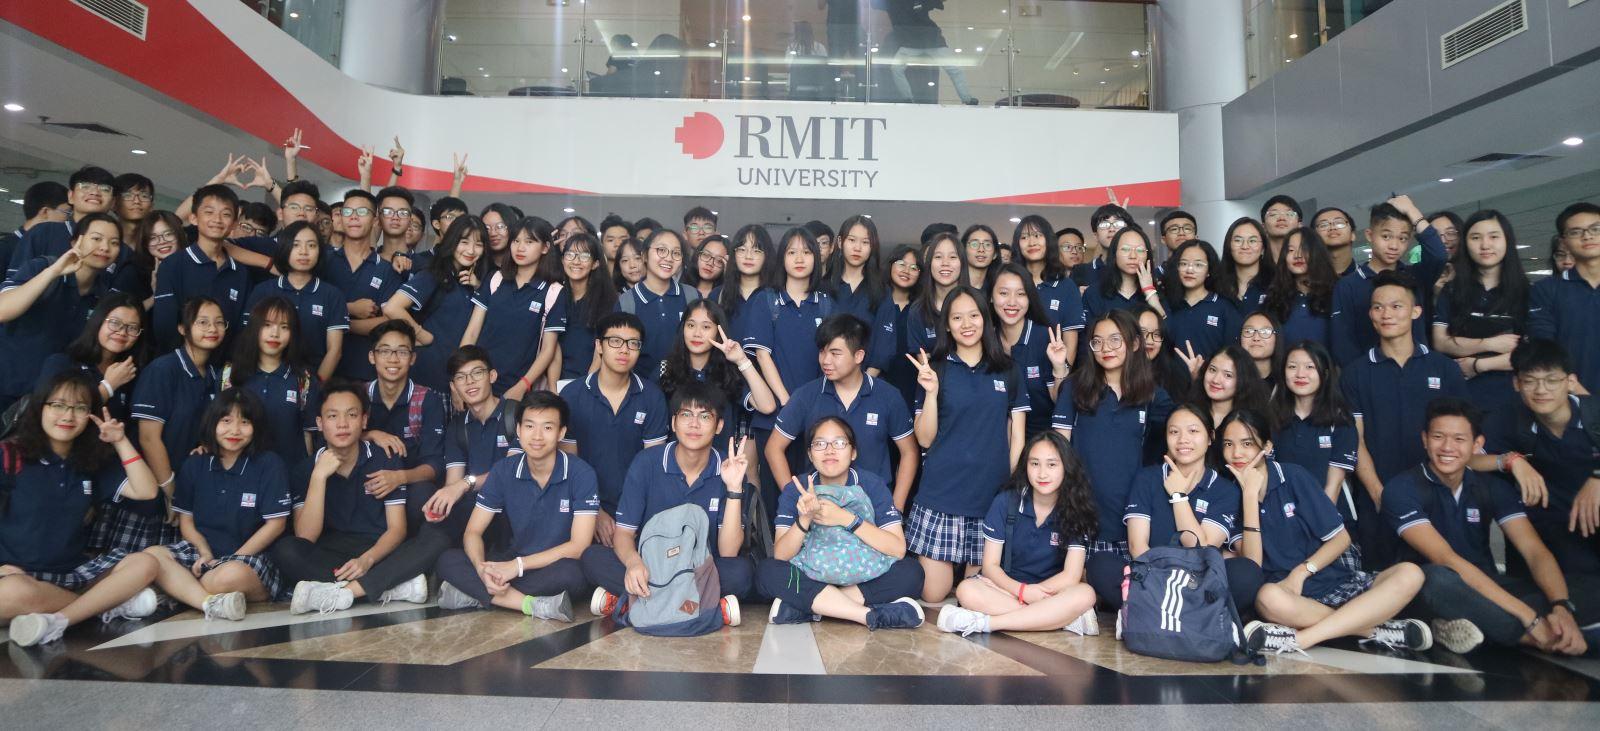 Khối 11 tham quan, học tập tại Đại học RMIT